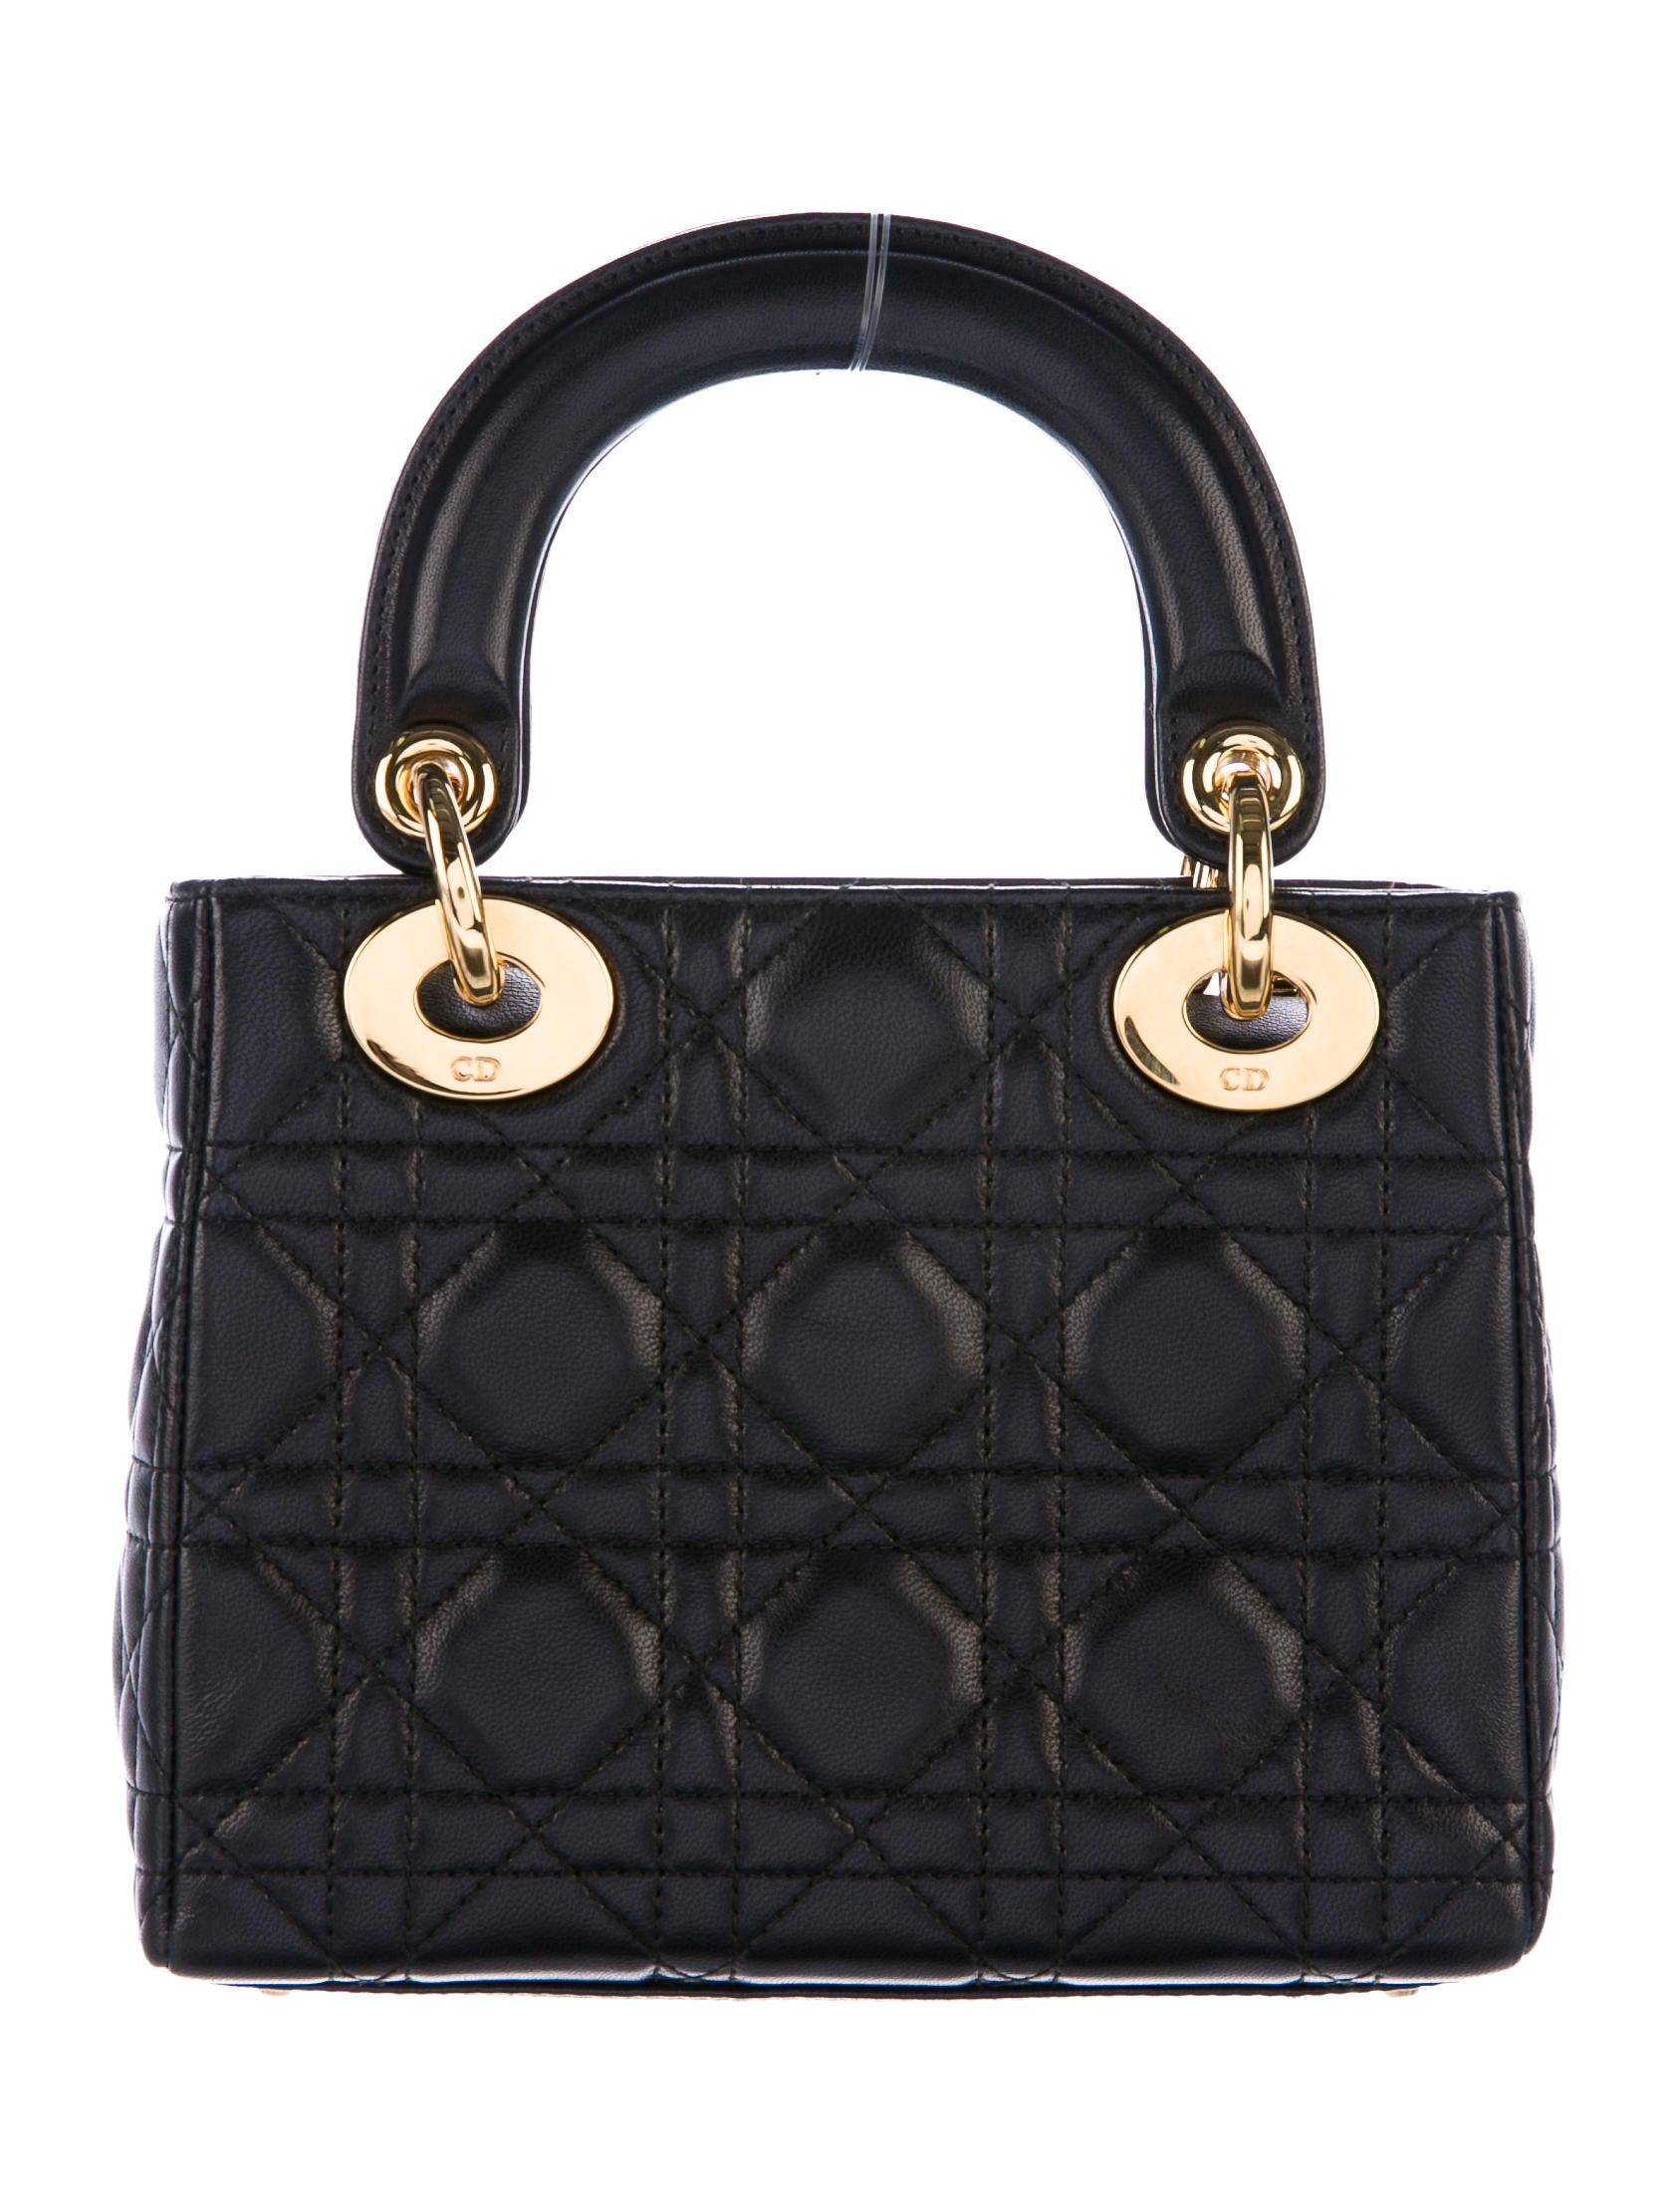 Christian Dior Vintage Mini Lady Dior Bag Handbags